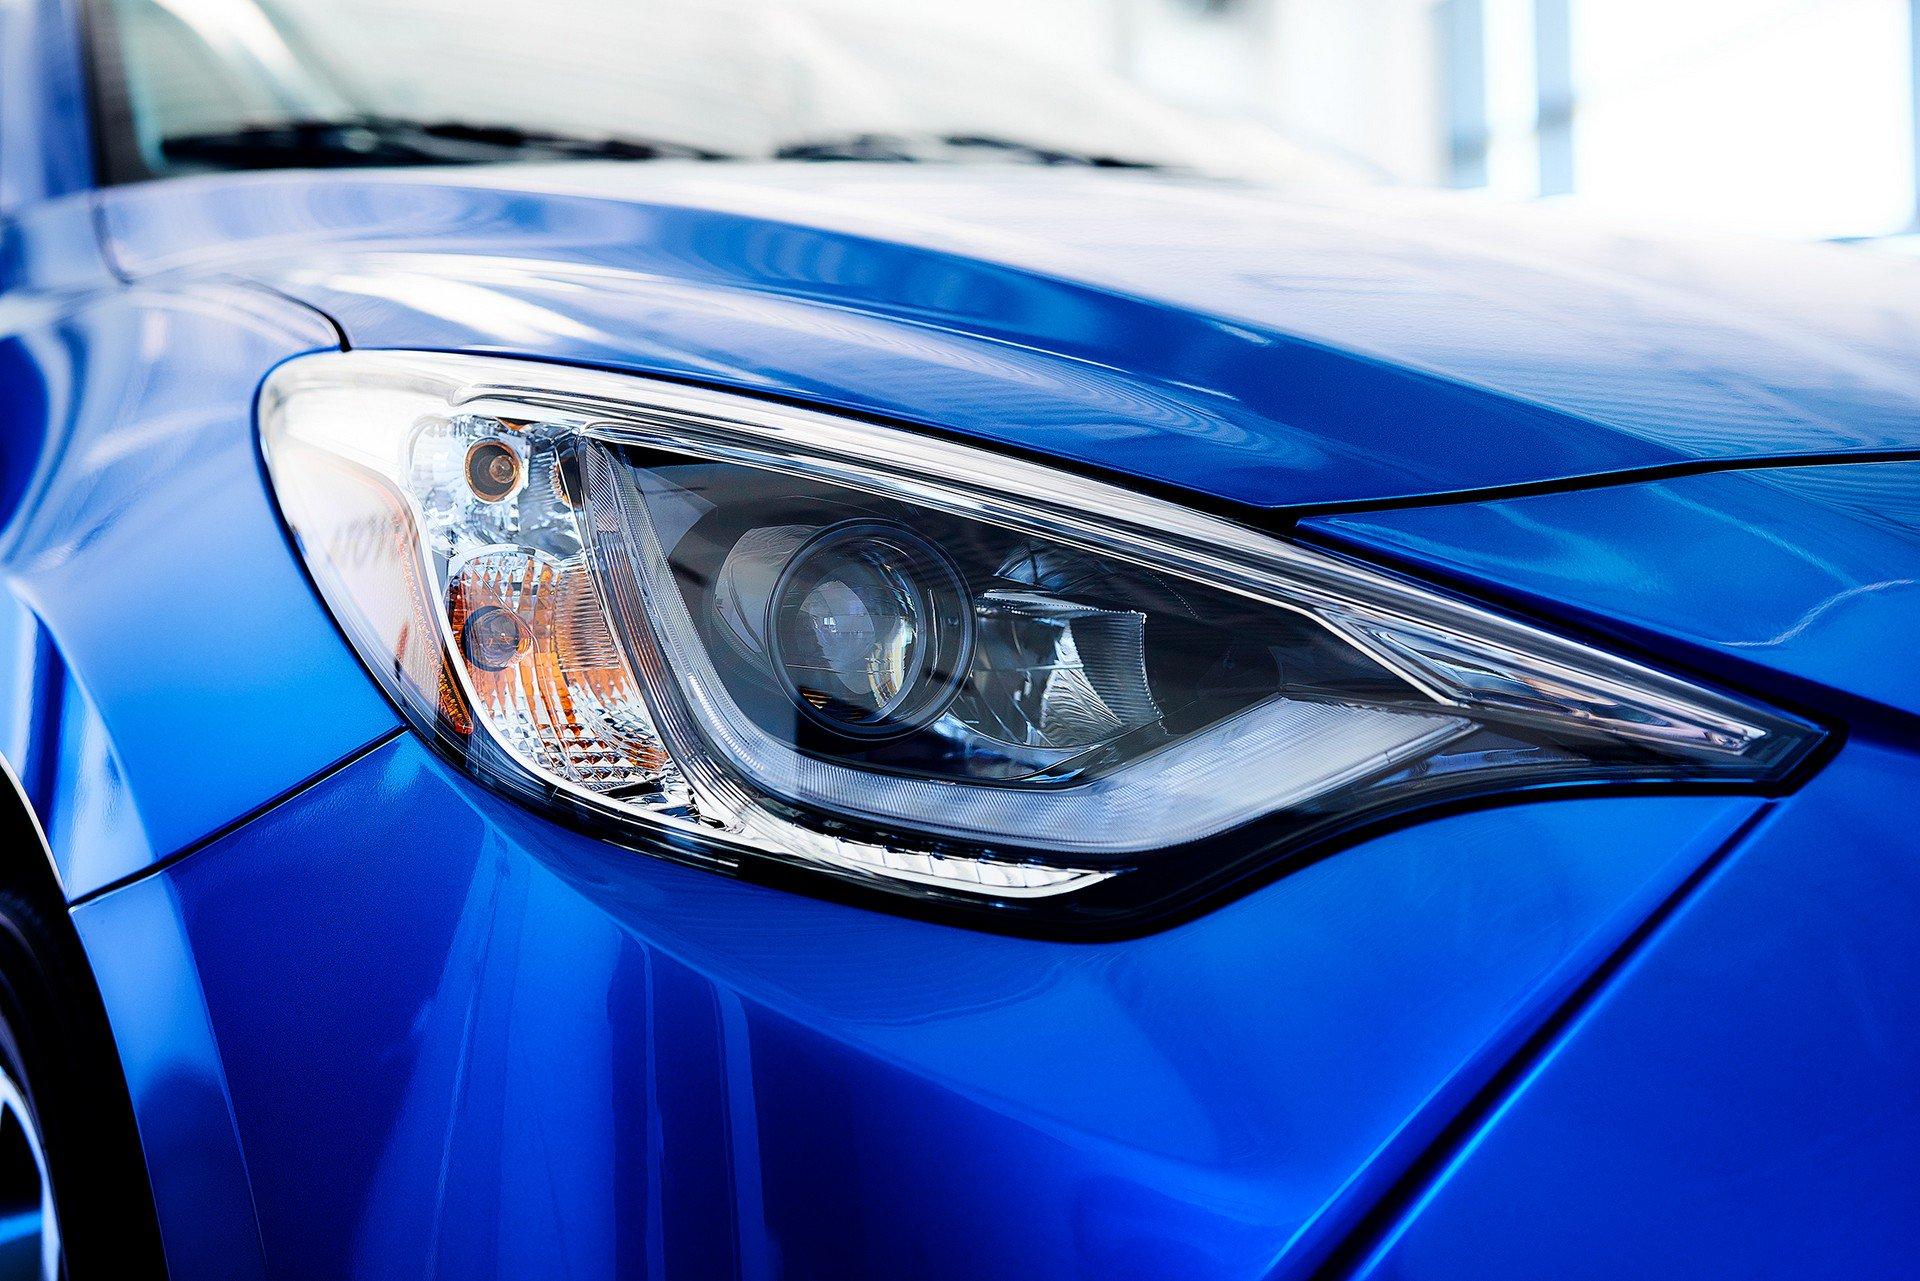 Toyota-Yaris-Hatchback-2020-5